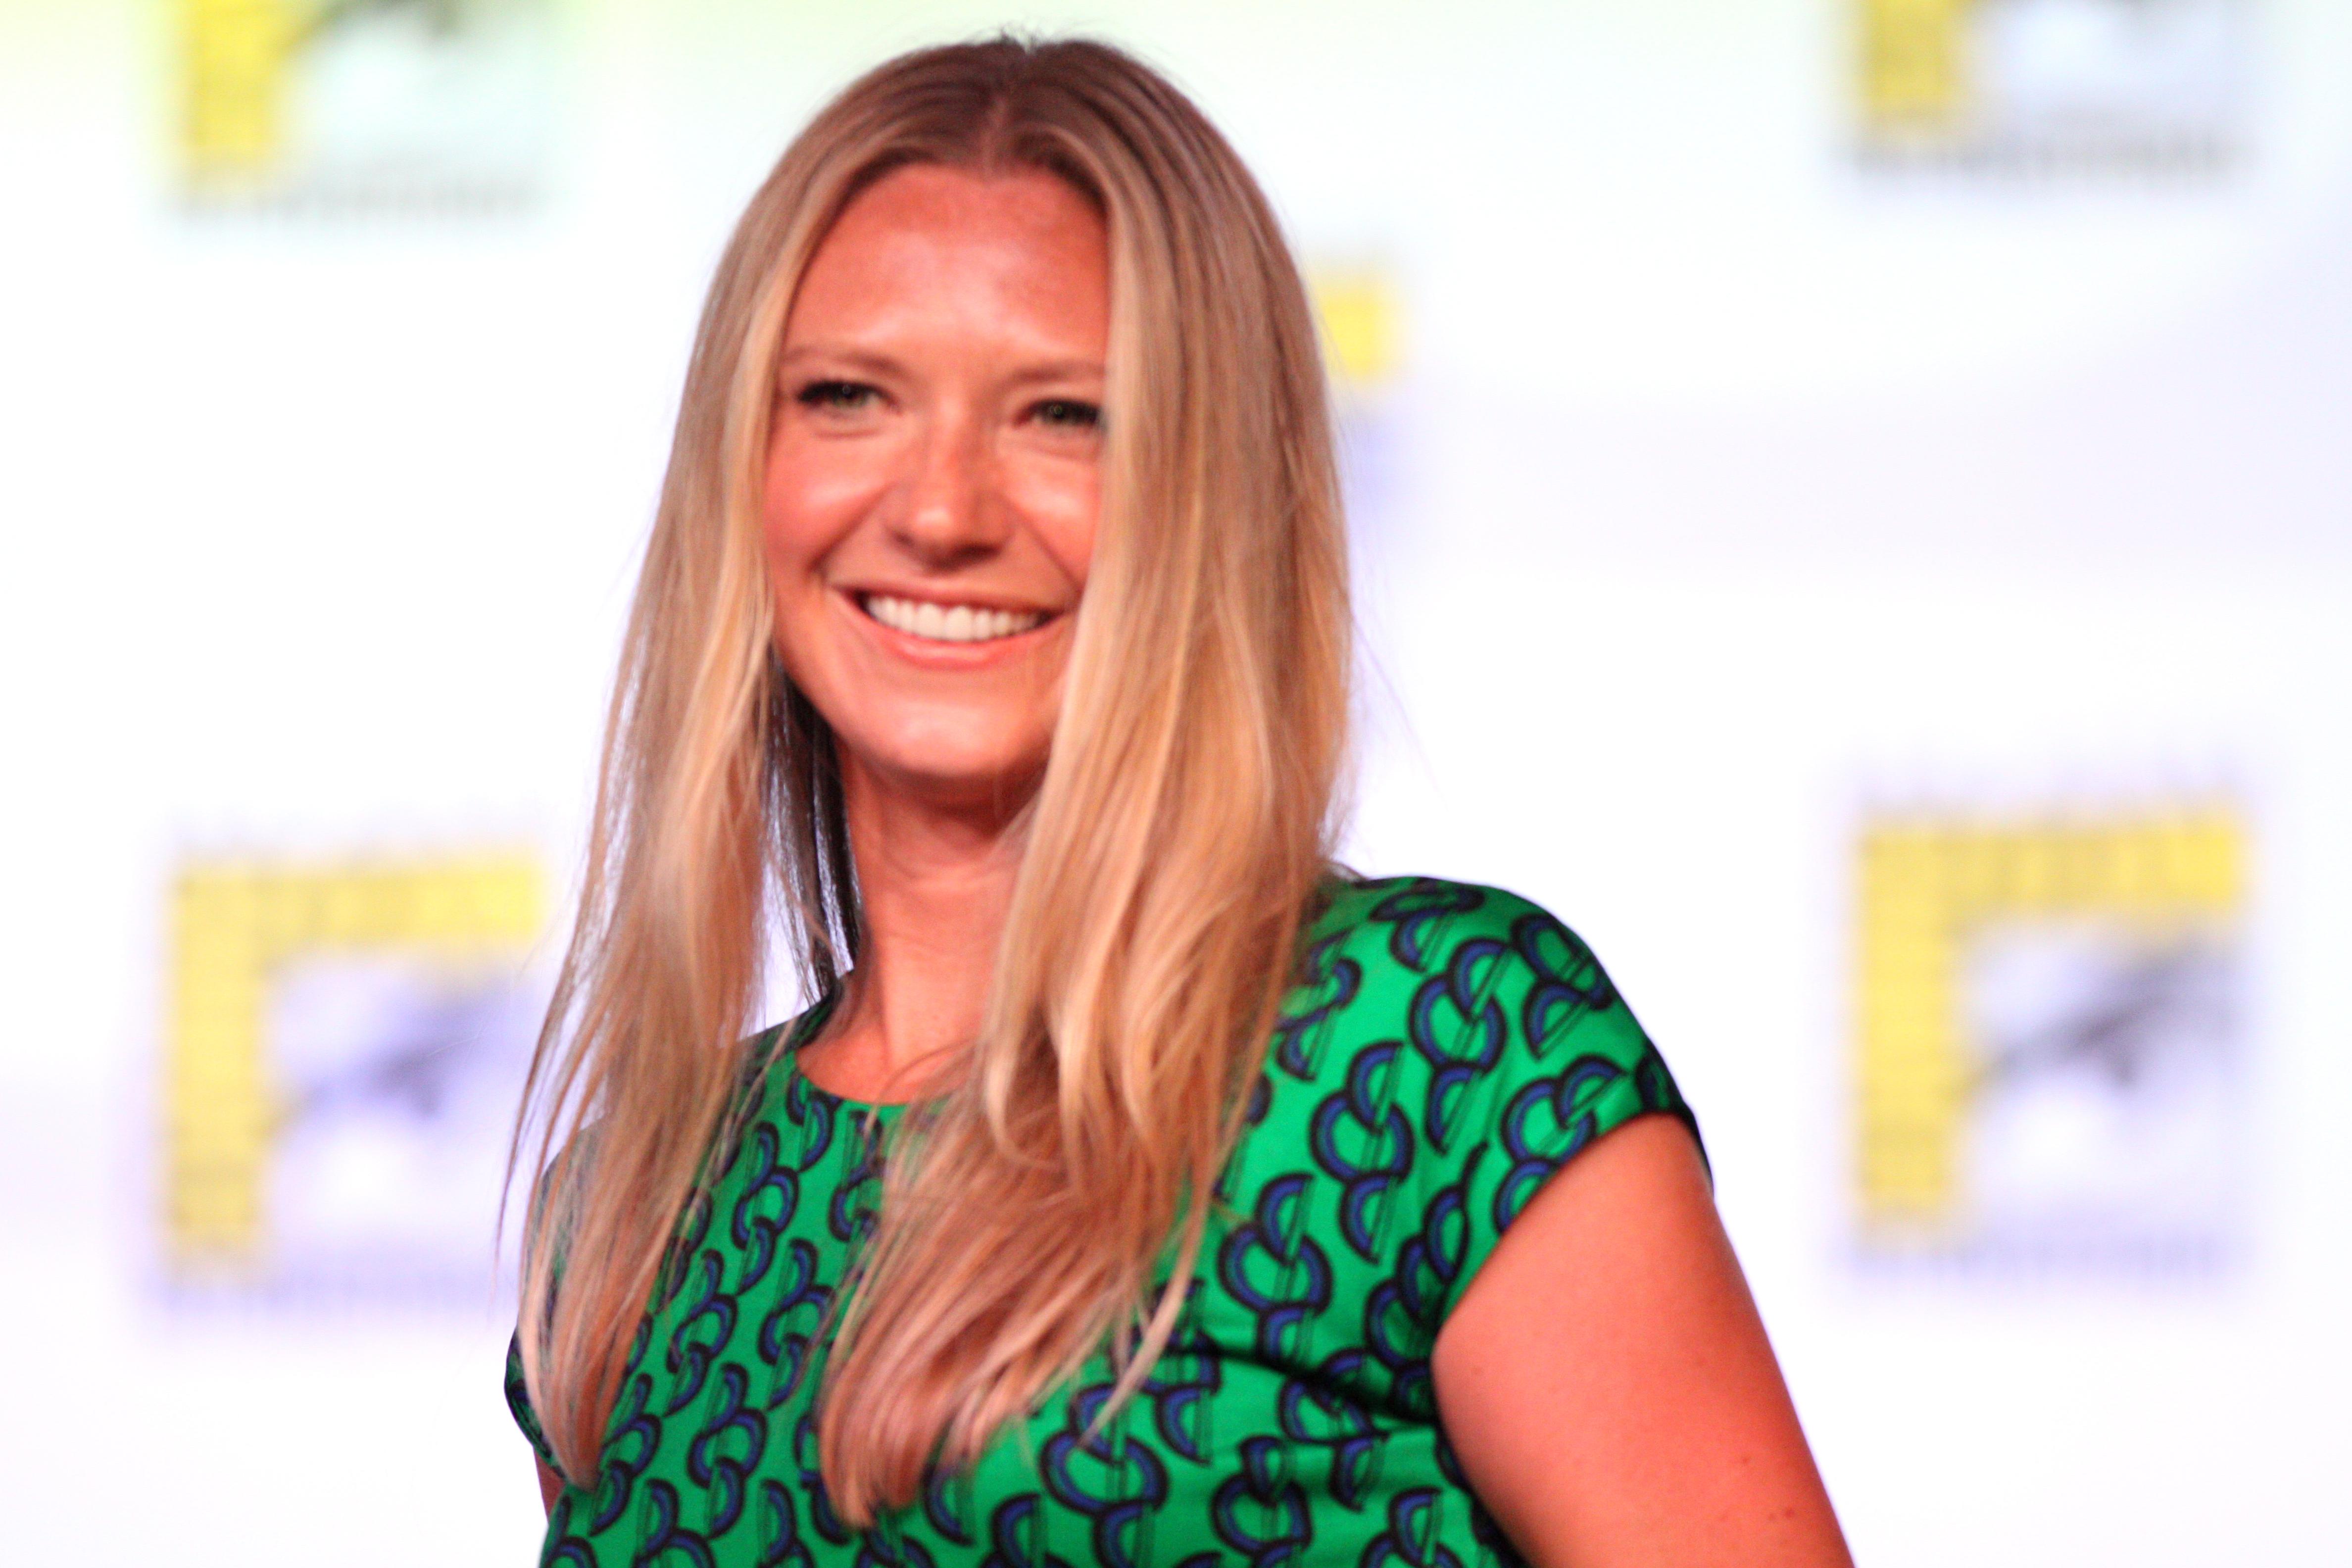 Helen Jacobs world singles ranking 1 advise